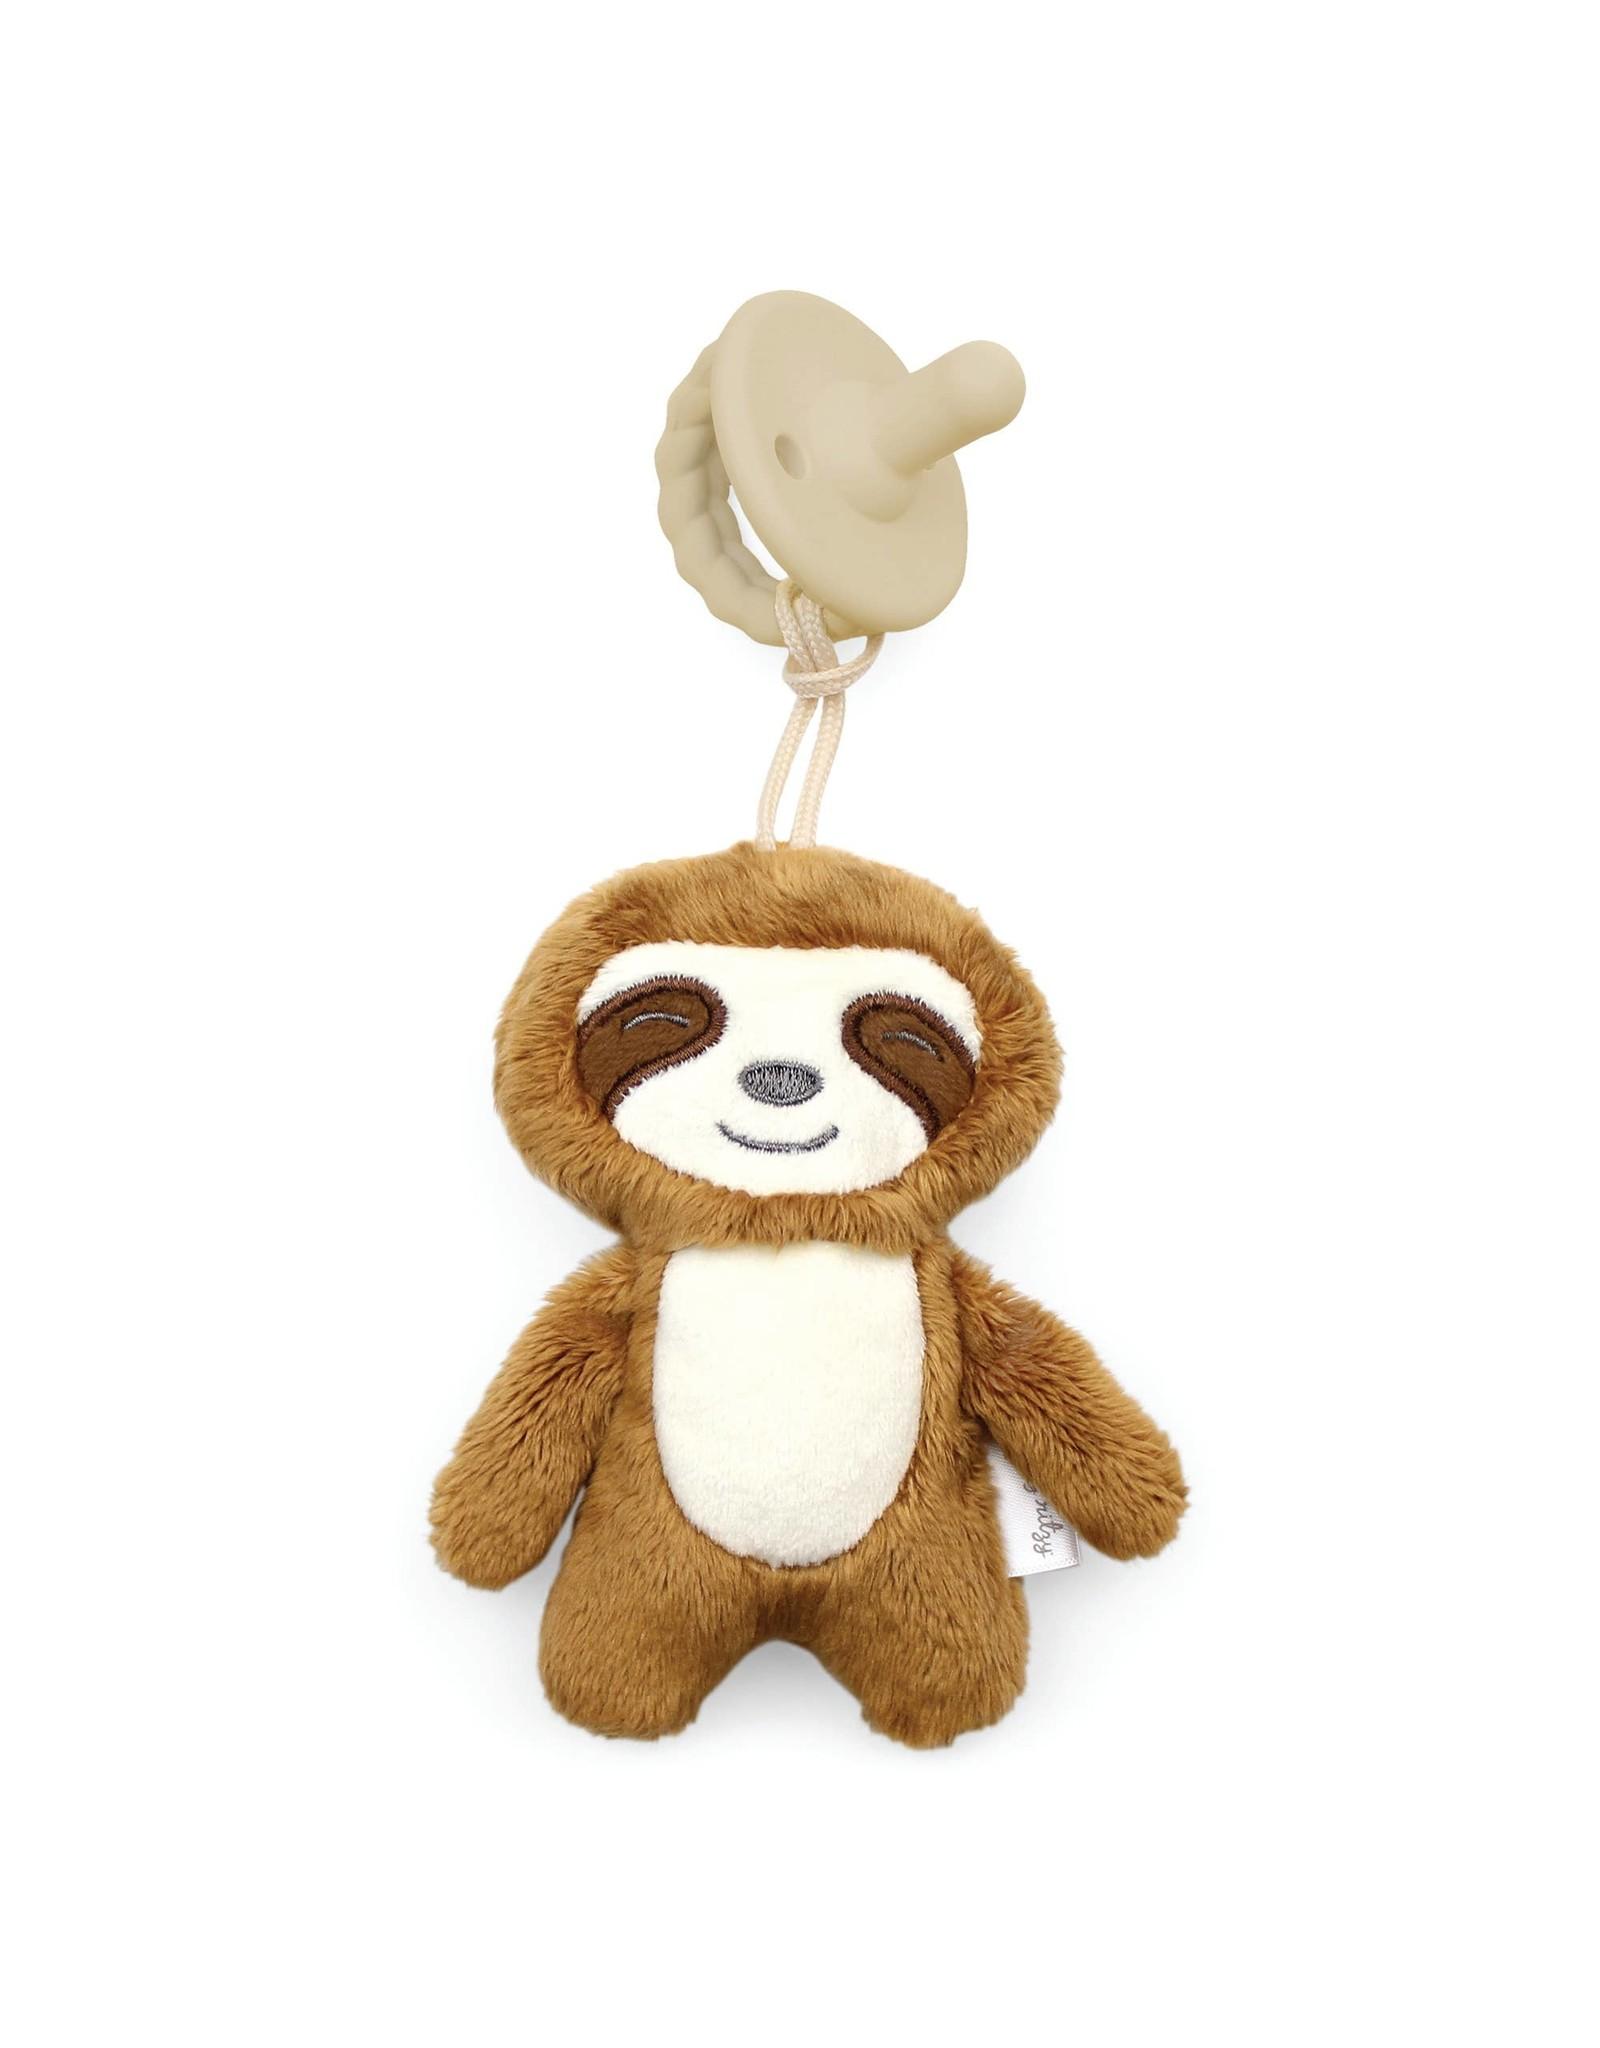 Itzy Ritzy Itzy Ritzy- Sweetie Pal Plush & Pacifier: Sloth